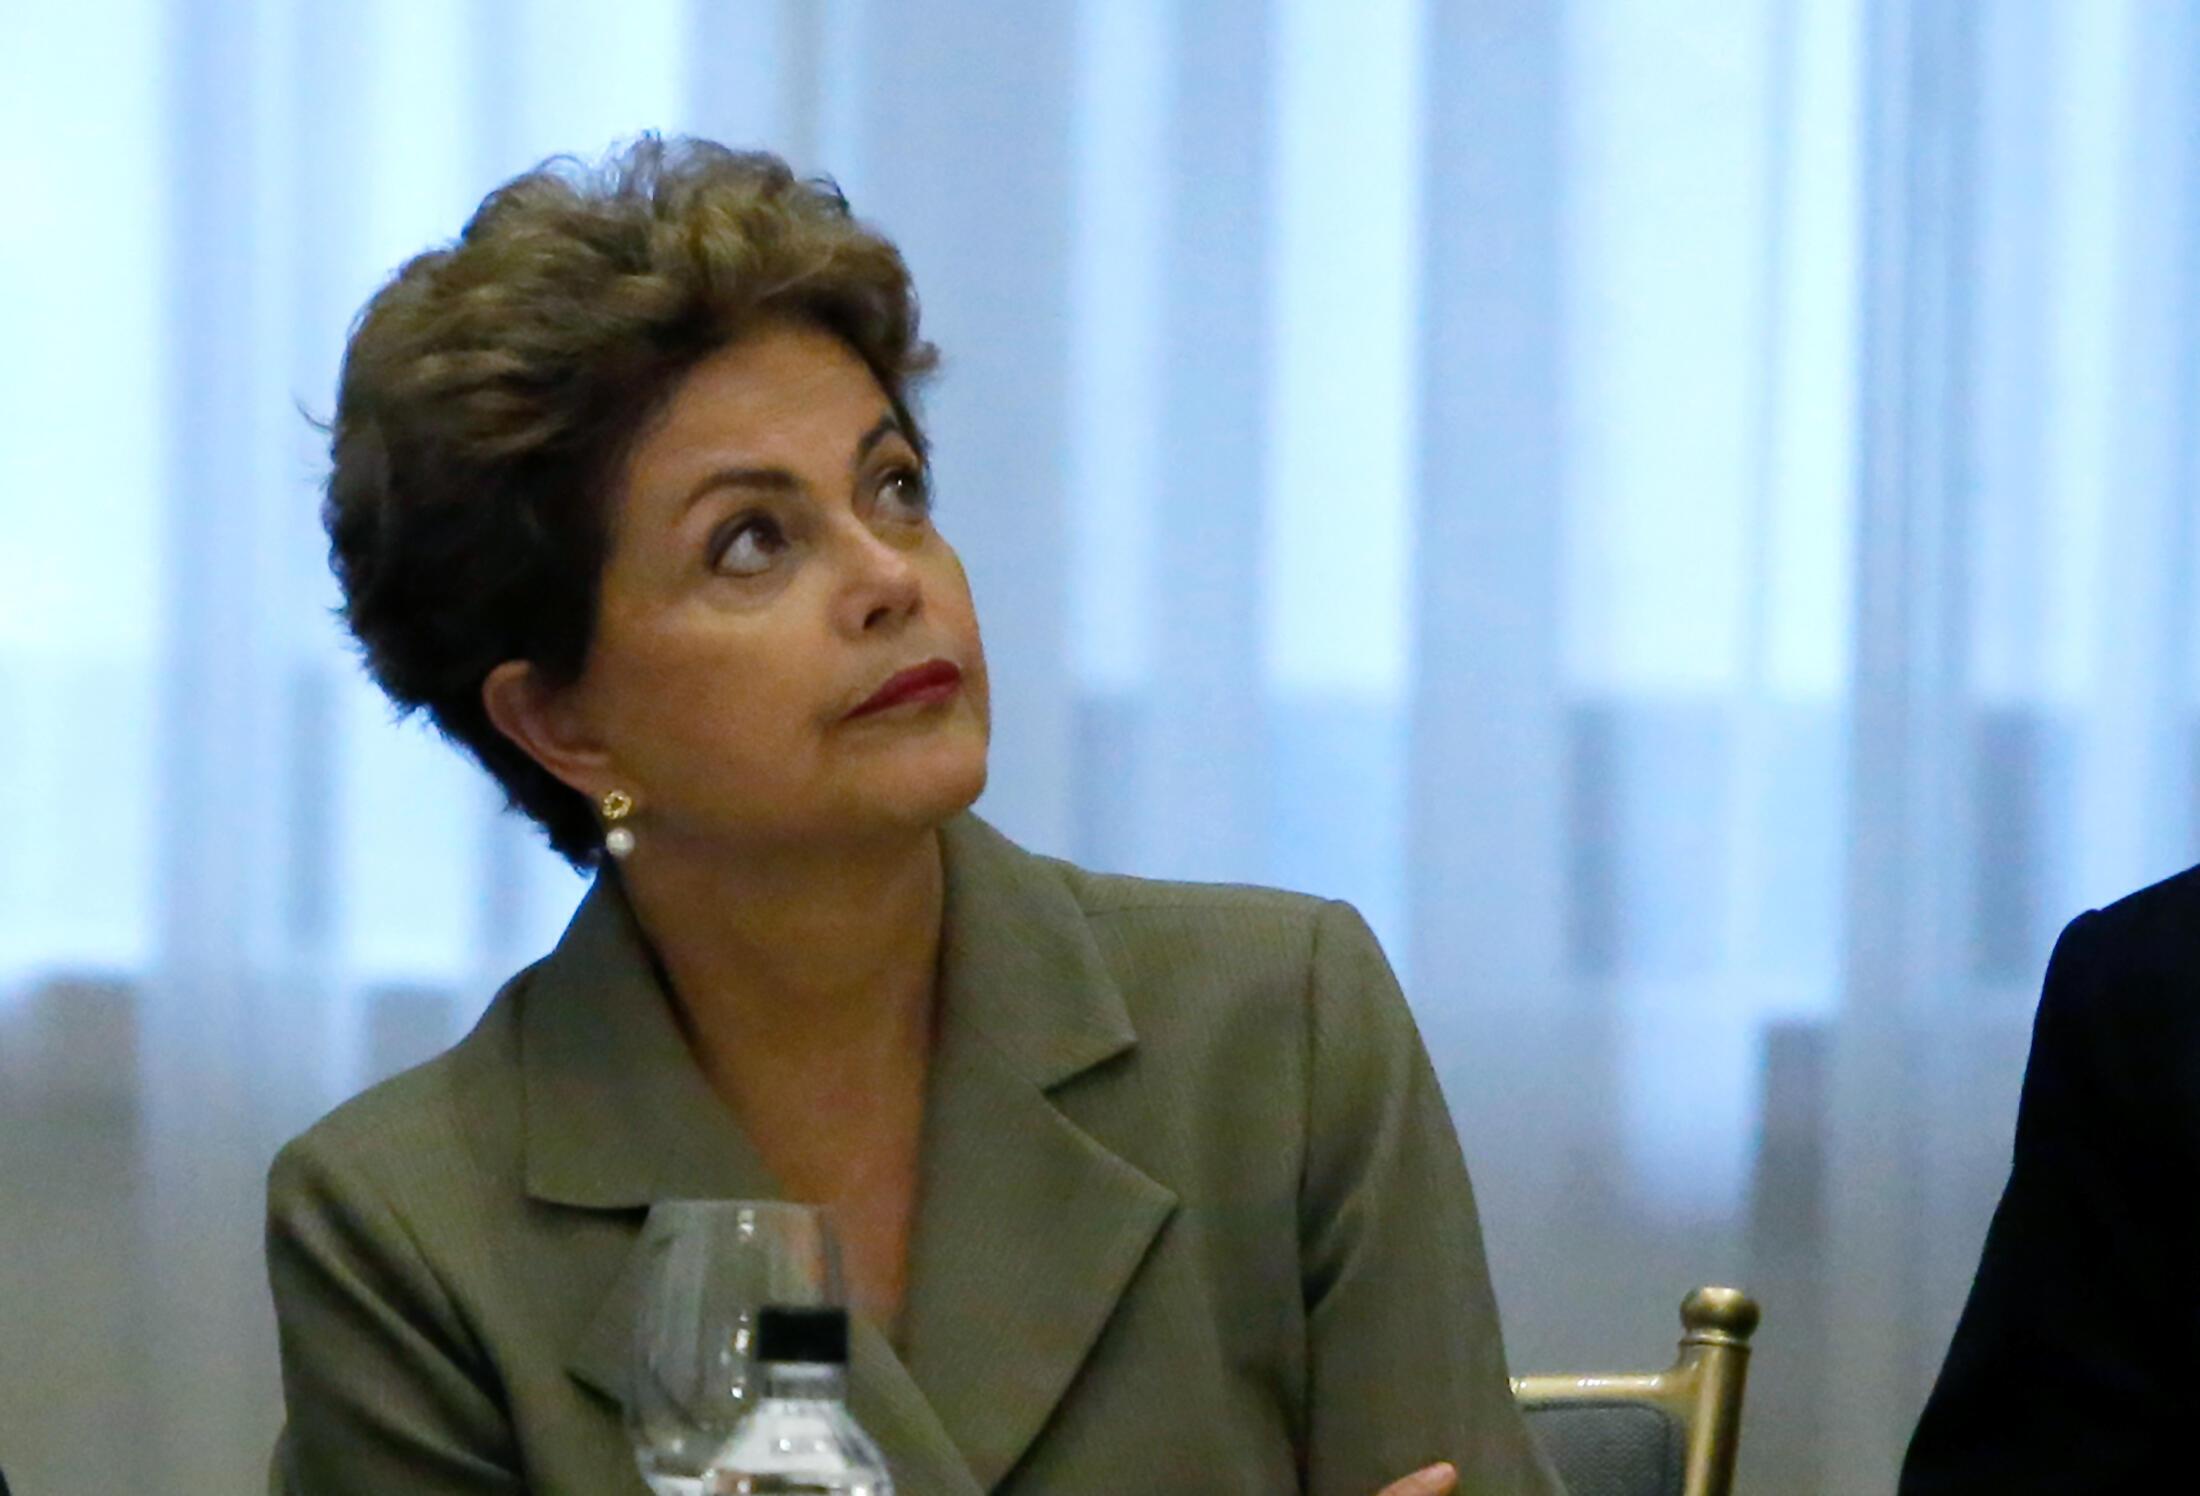 Shugaban Brazil  Dilma Rousseff